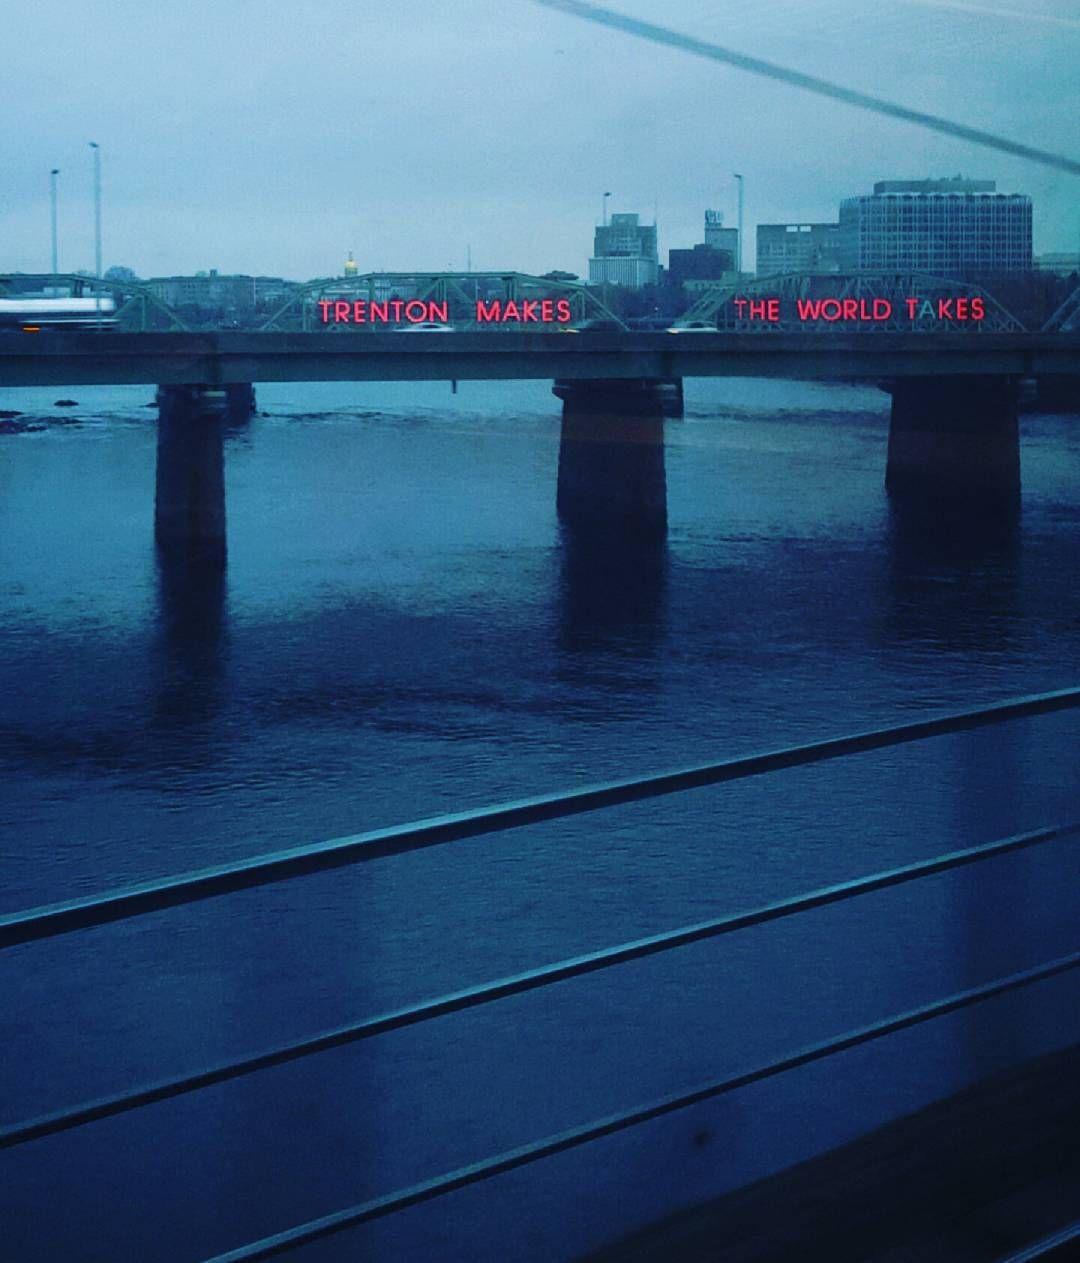 Trenton, NJ Instagram, Places to visit, Instagram posts